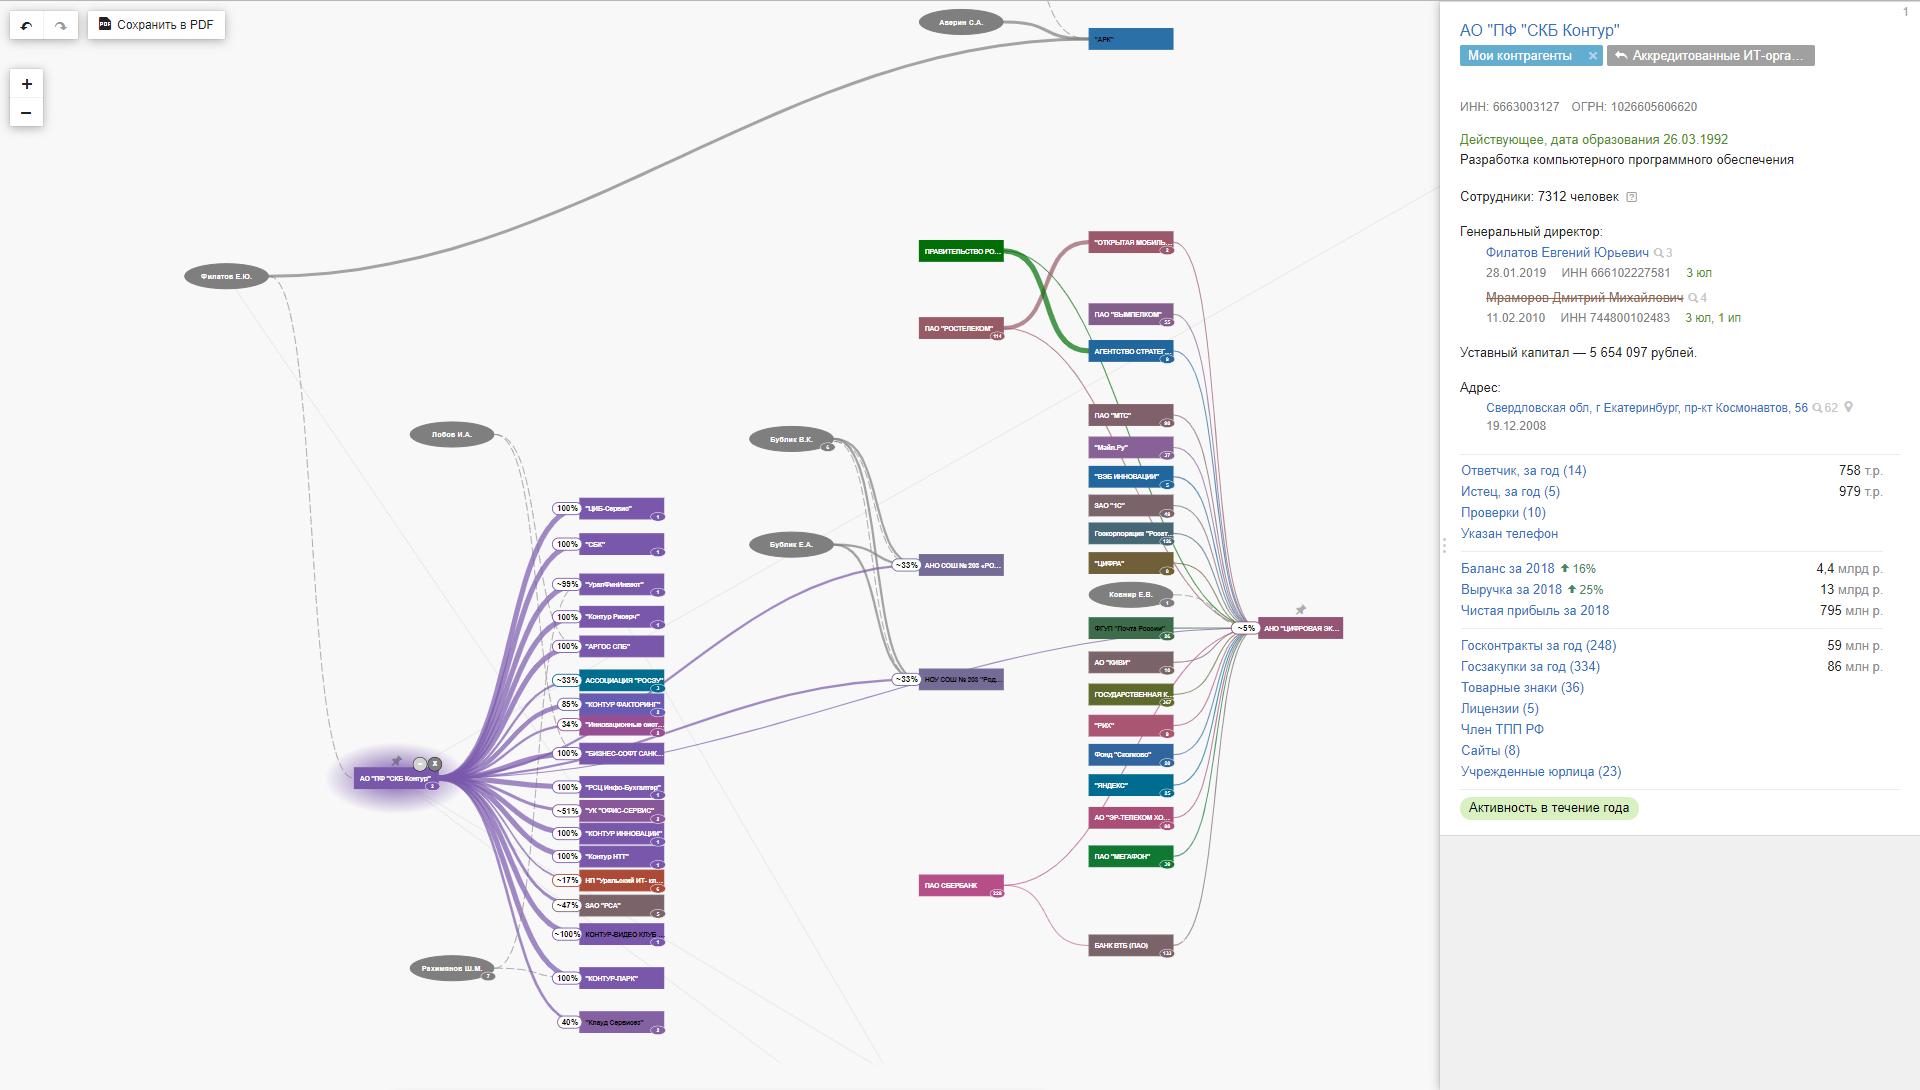 Визуализация списка связей